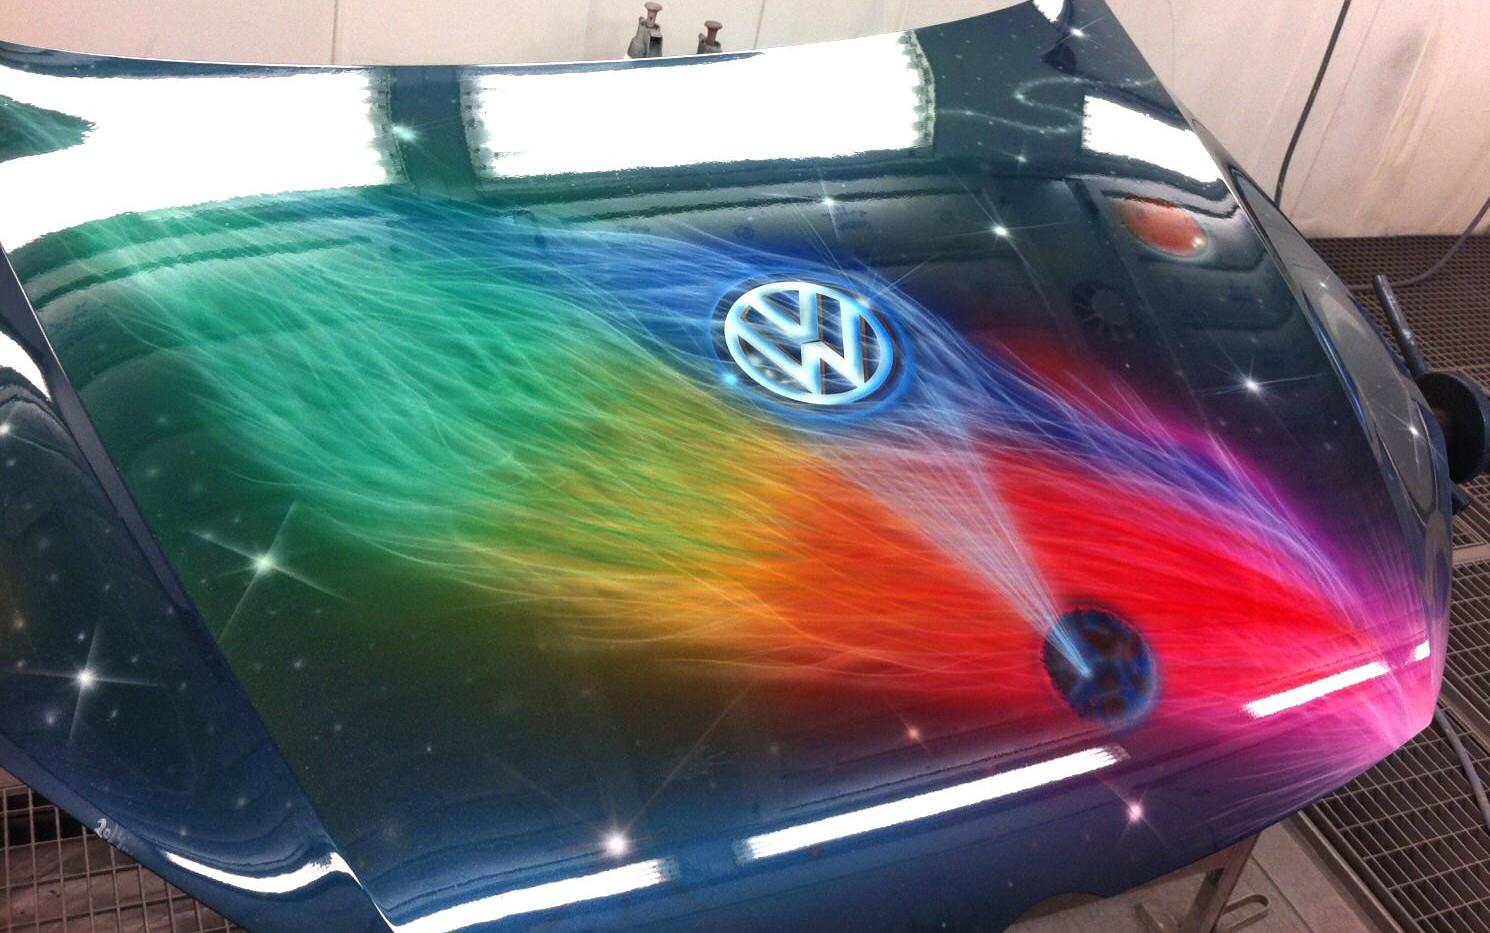 Airbrush auf einer Motorhaube